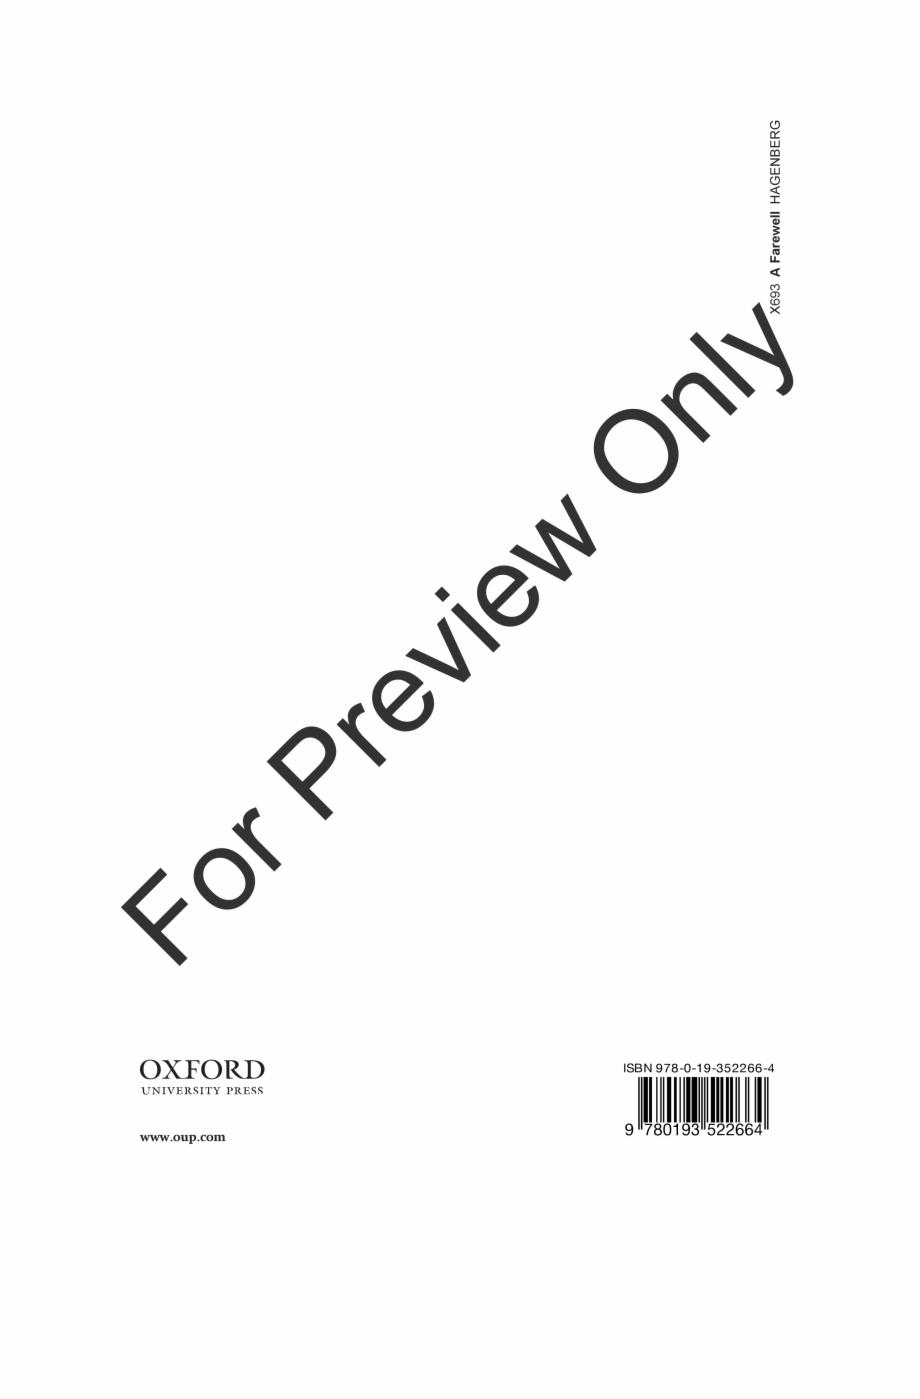 Oxford university press logo clipart clipart Thumbnail A Farewell Thumbnail - Oxford University Press ... clipart